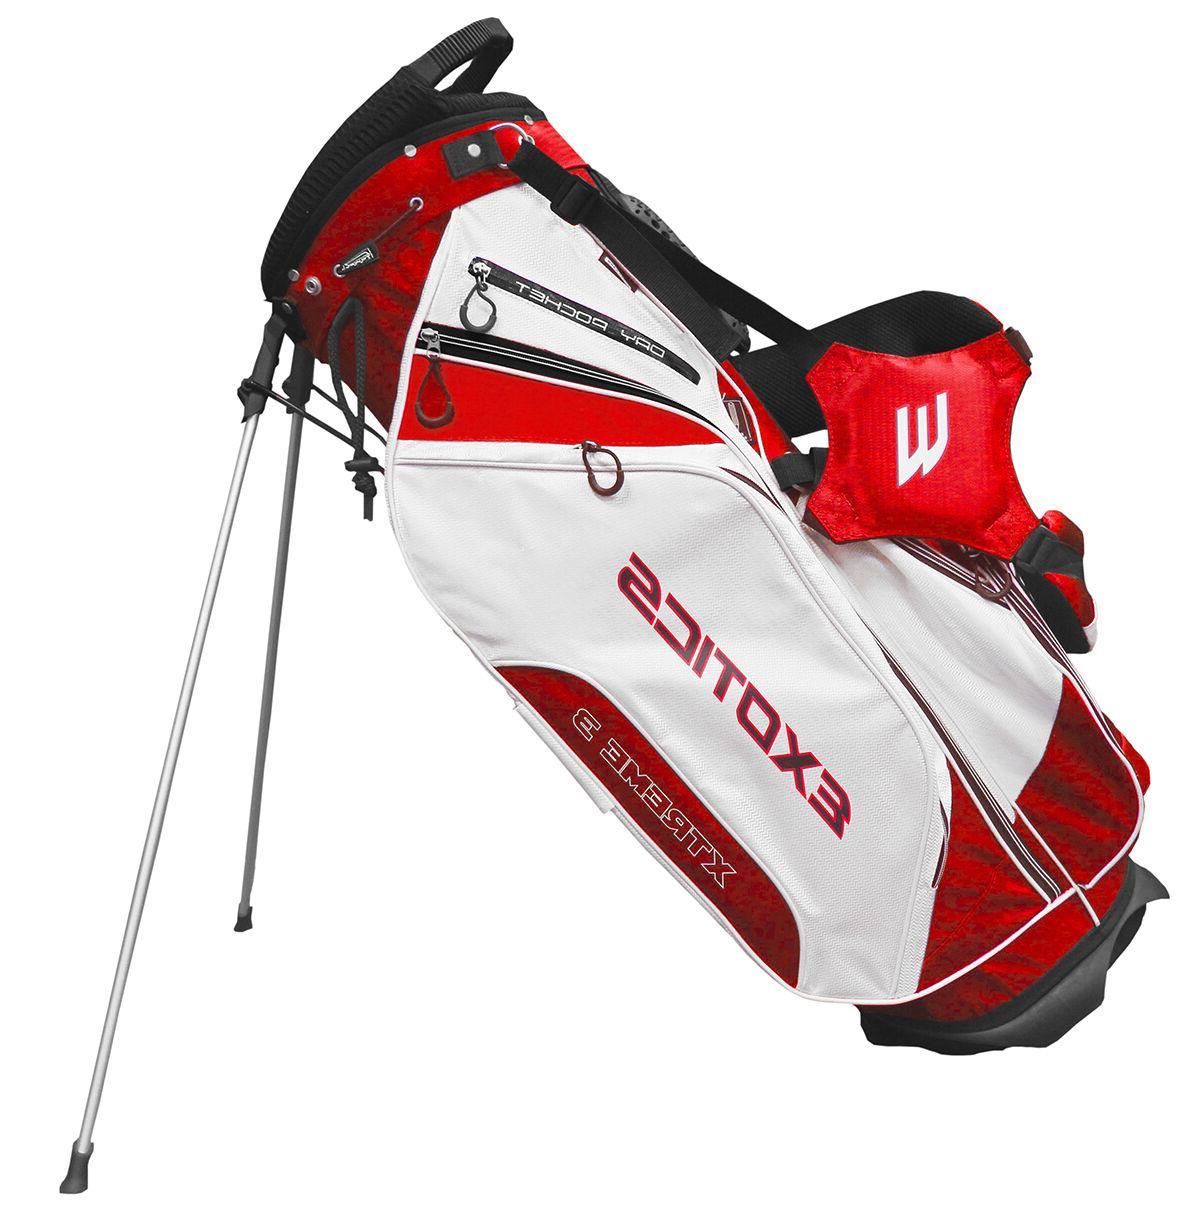 Tour Golf Exotics Extreme - Available -